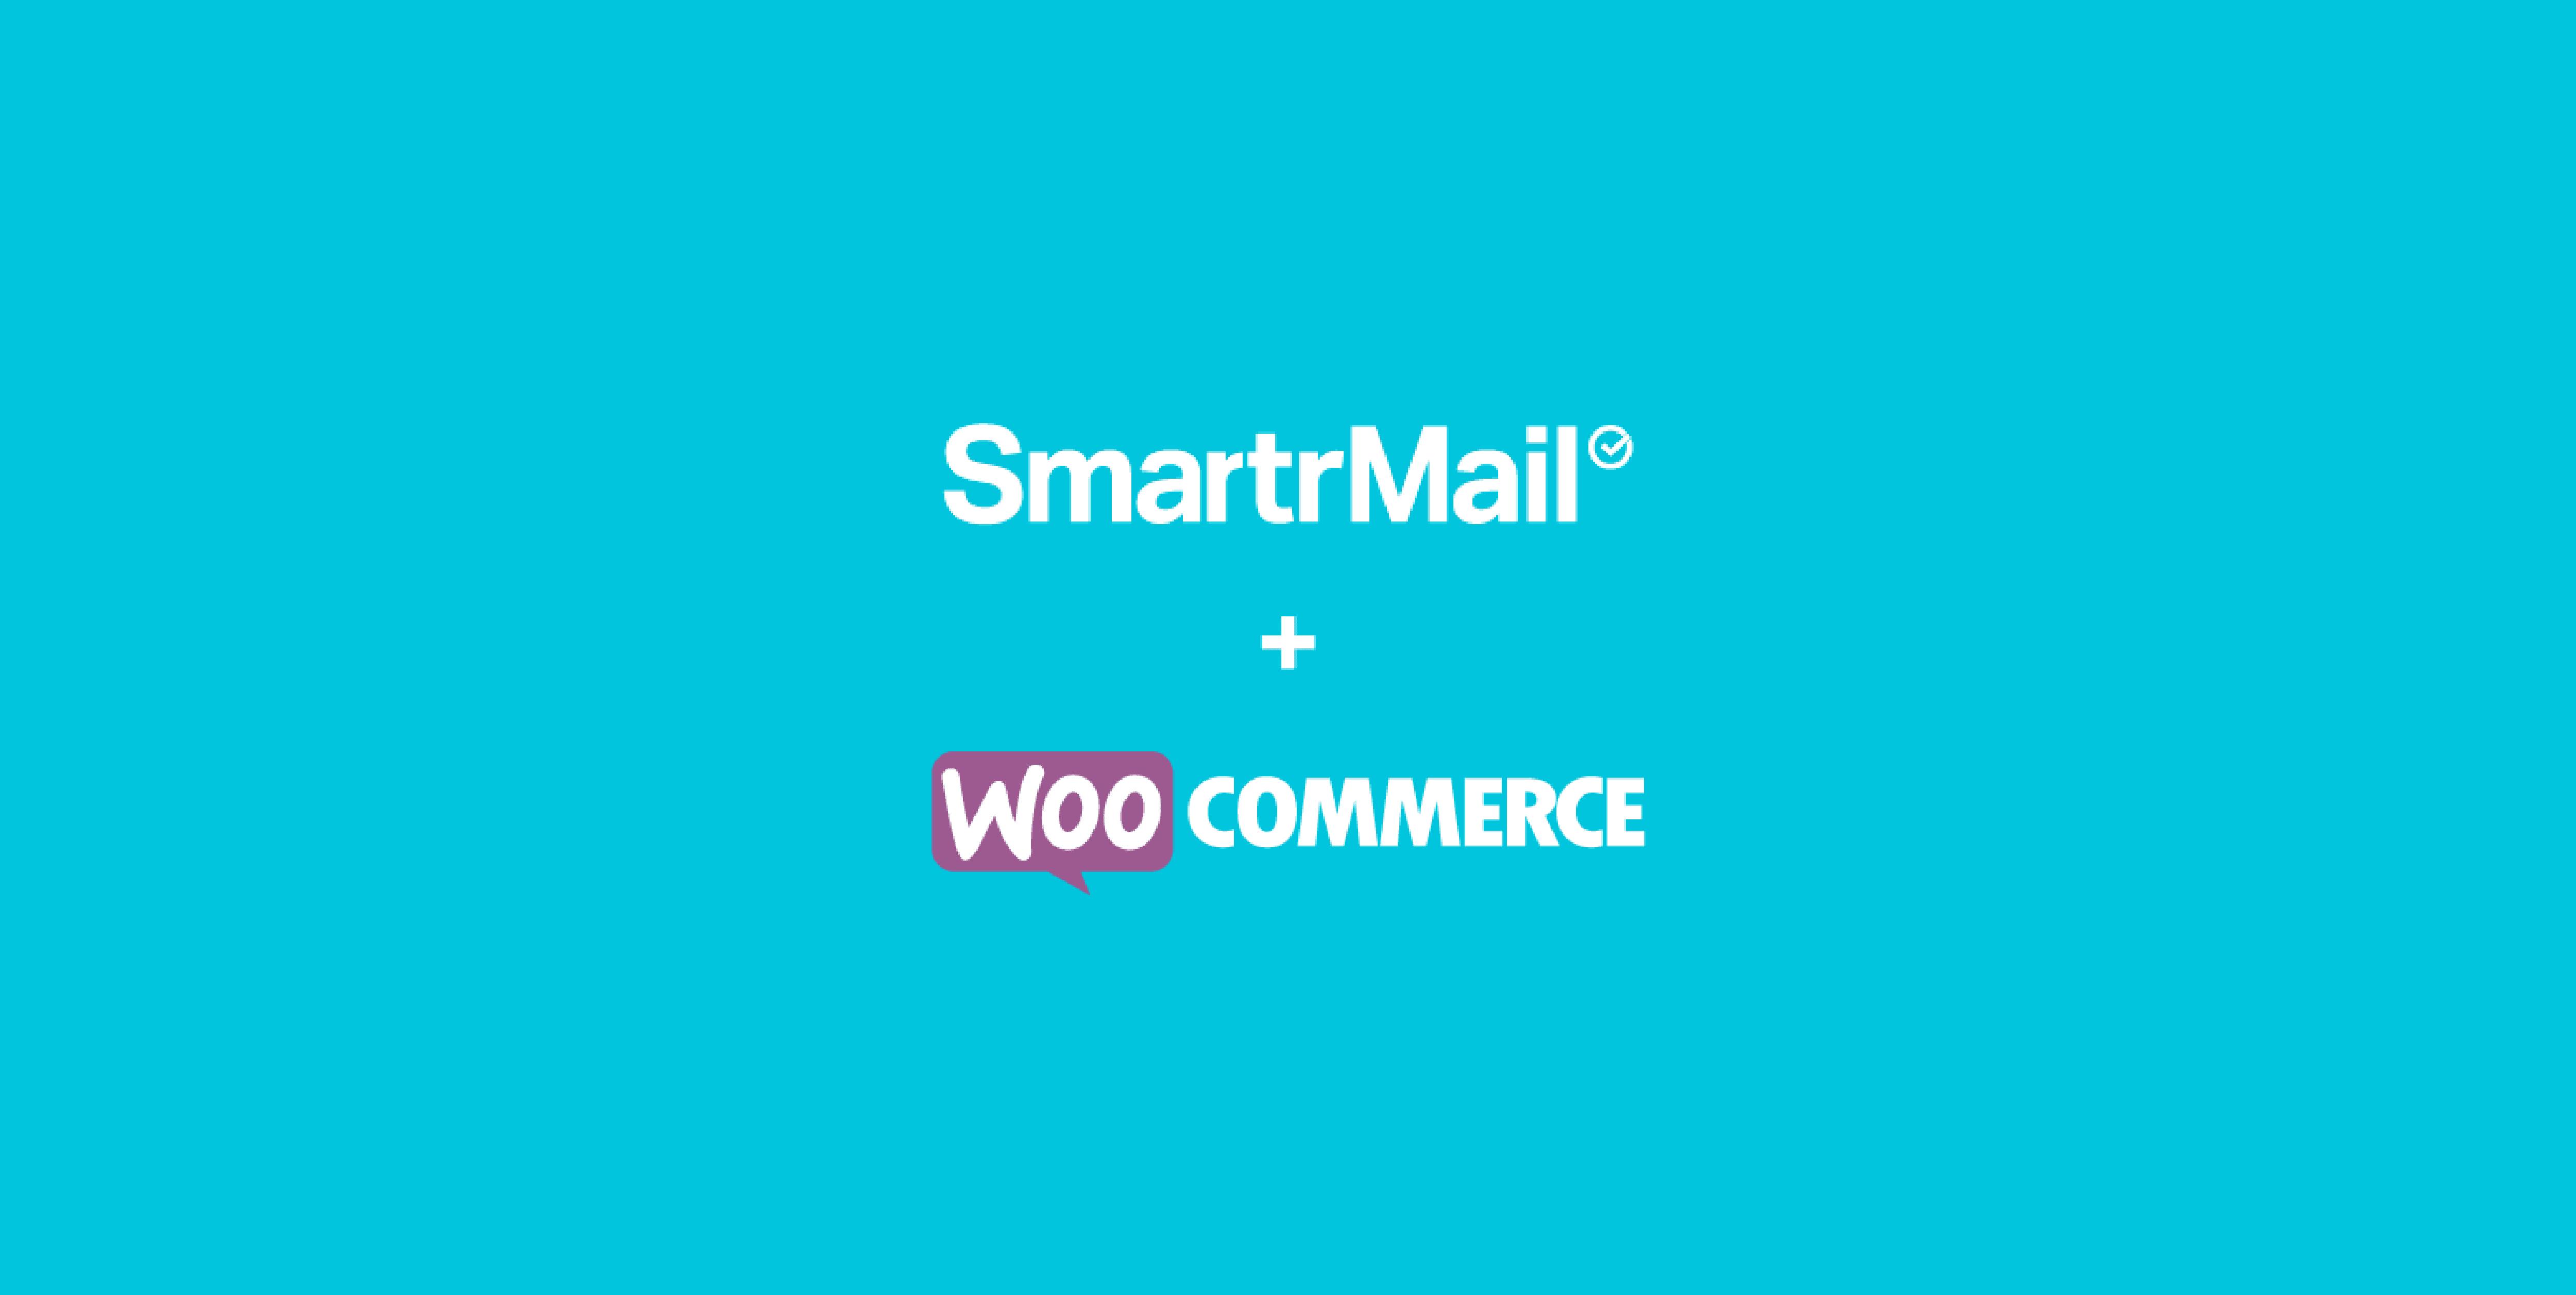 SmartrMail+WooCommerce Header